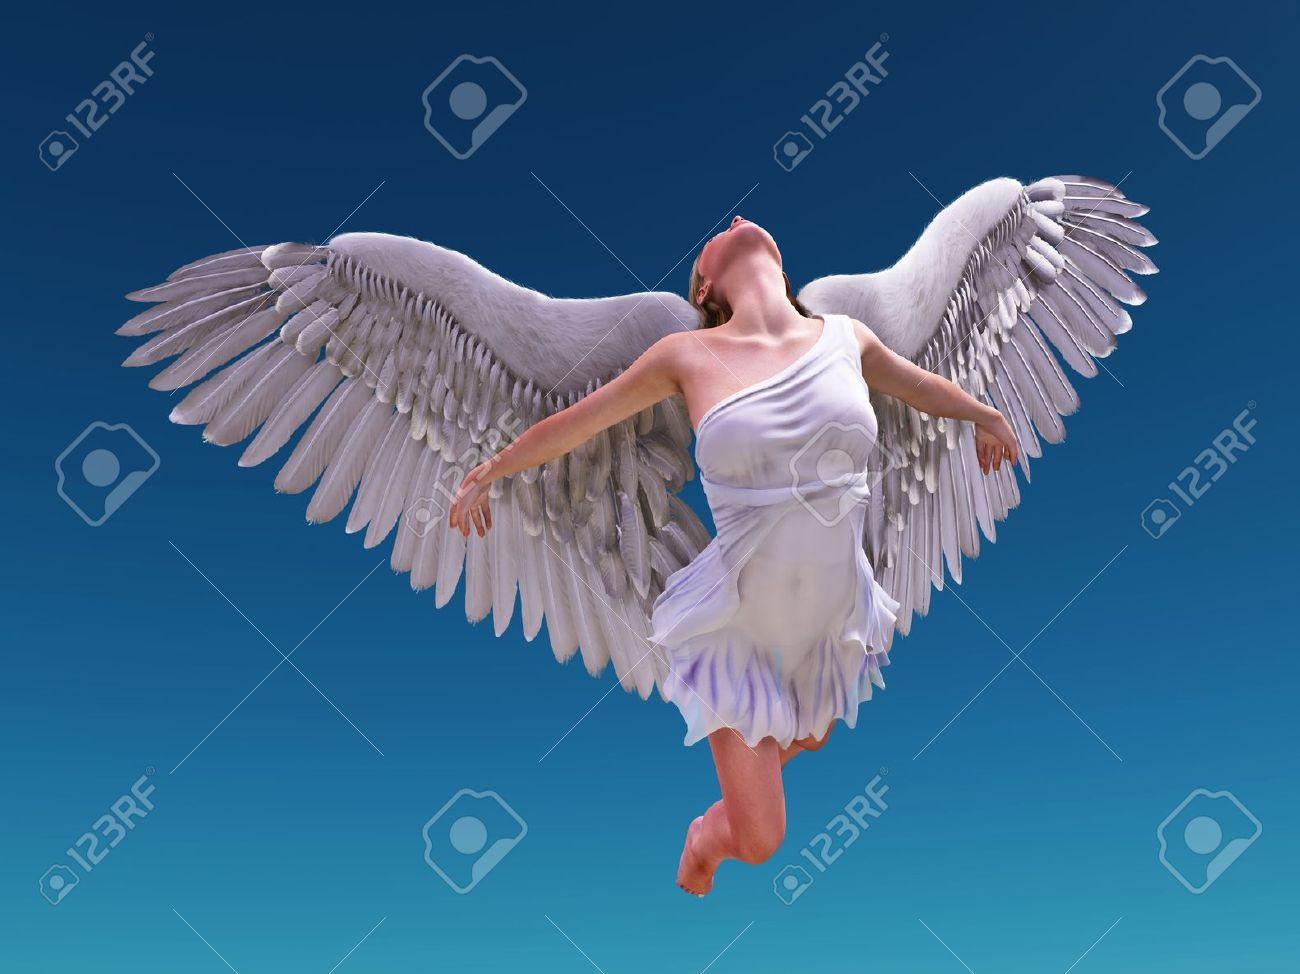 angel fly to sky Stock Photo - 11545435